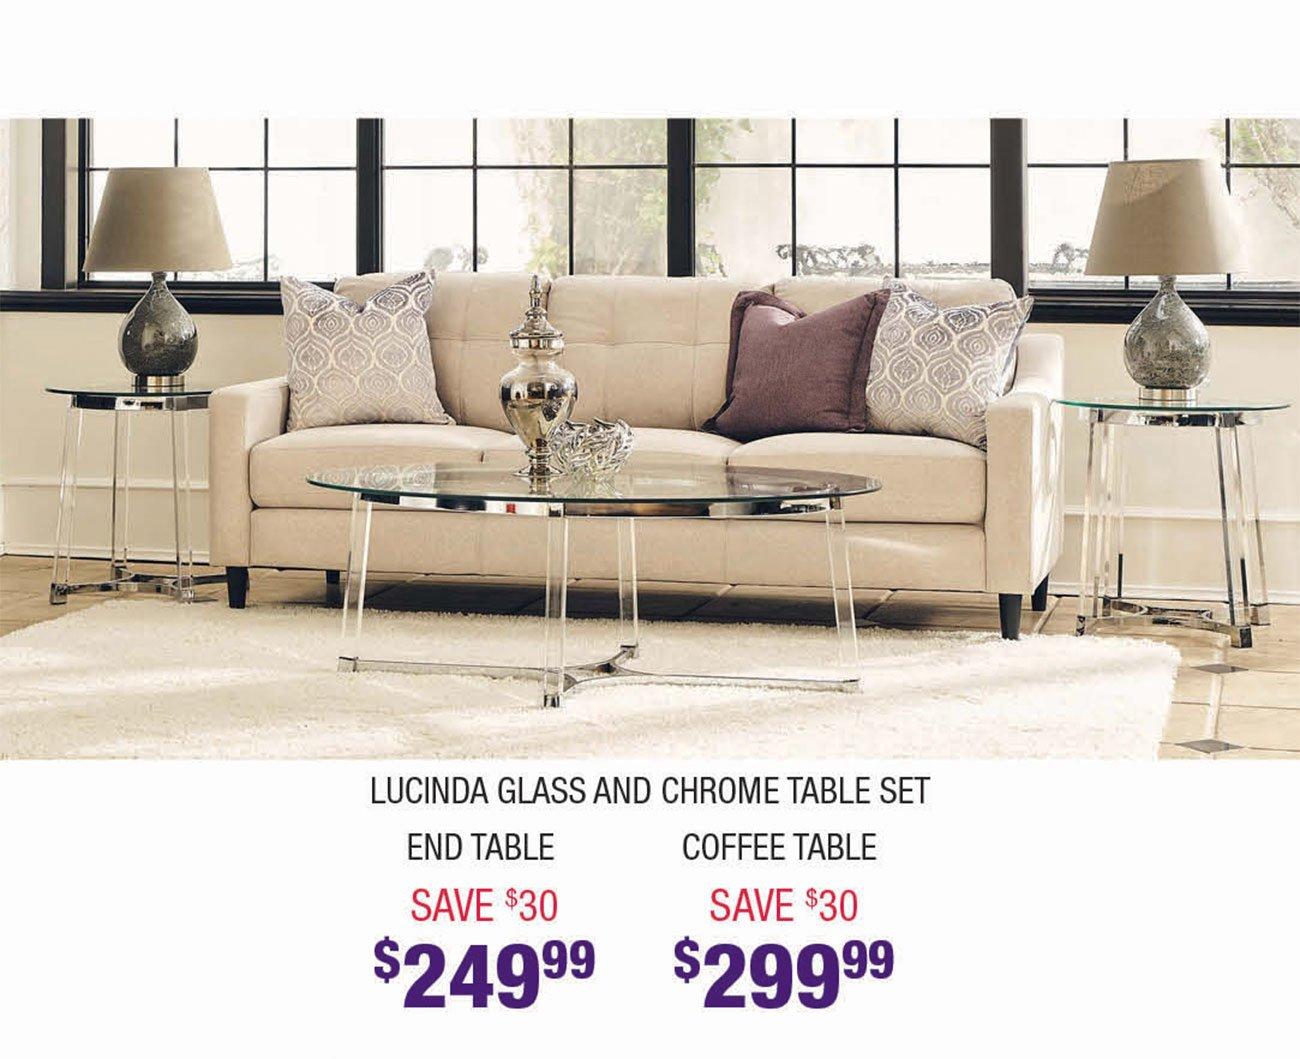 Lucinda-Glass-Chrome-Table-Set